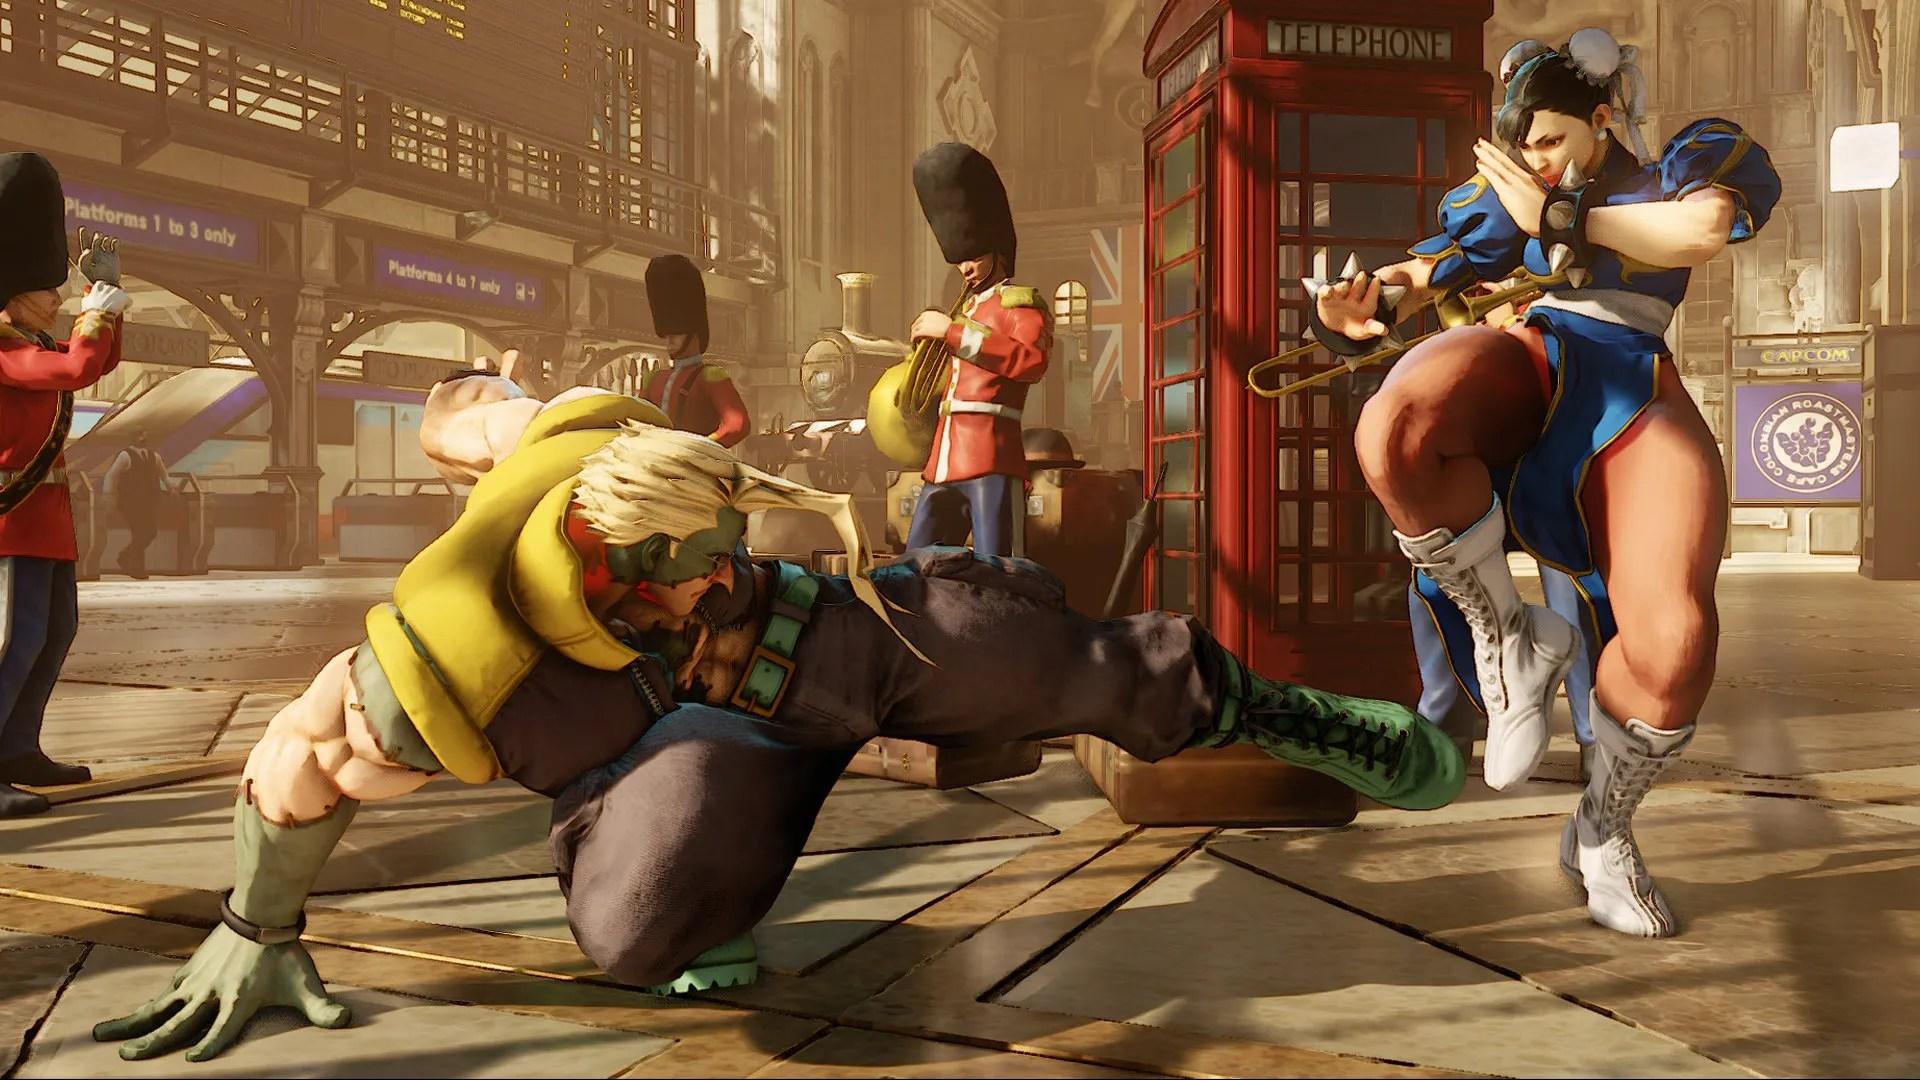 street fighter games - HD1920×1080